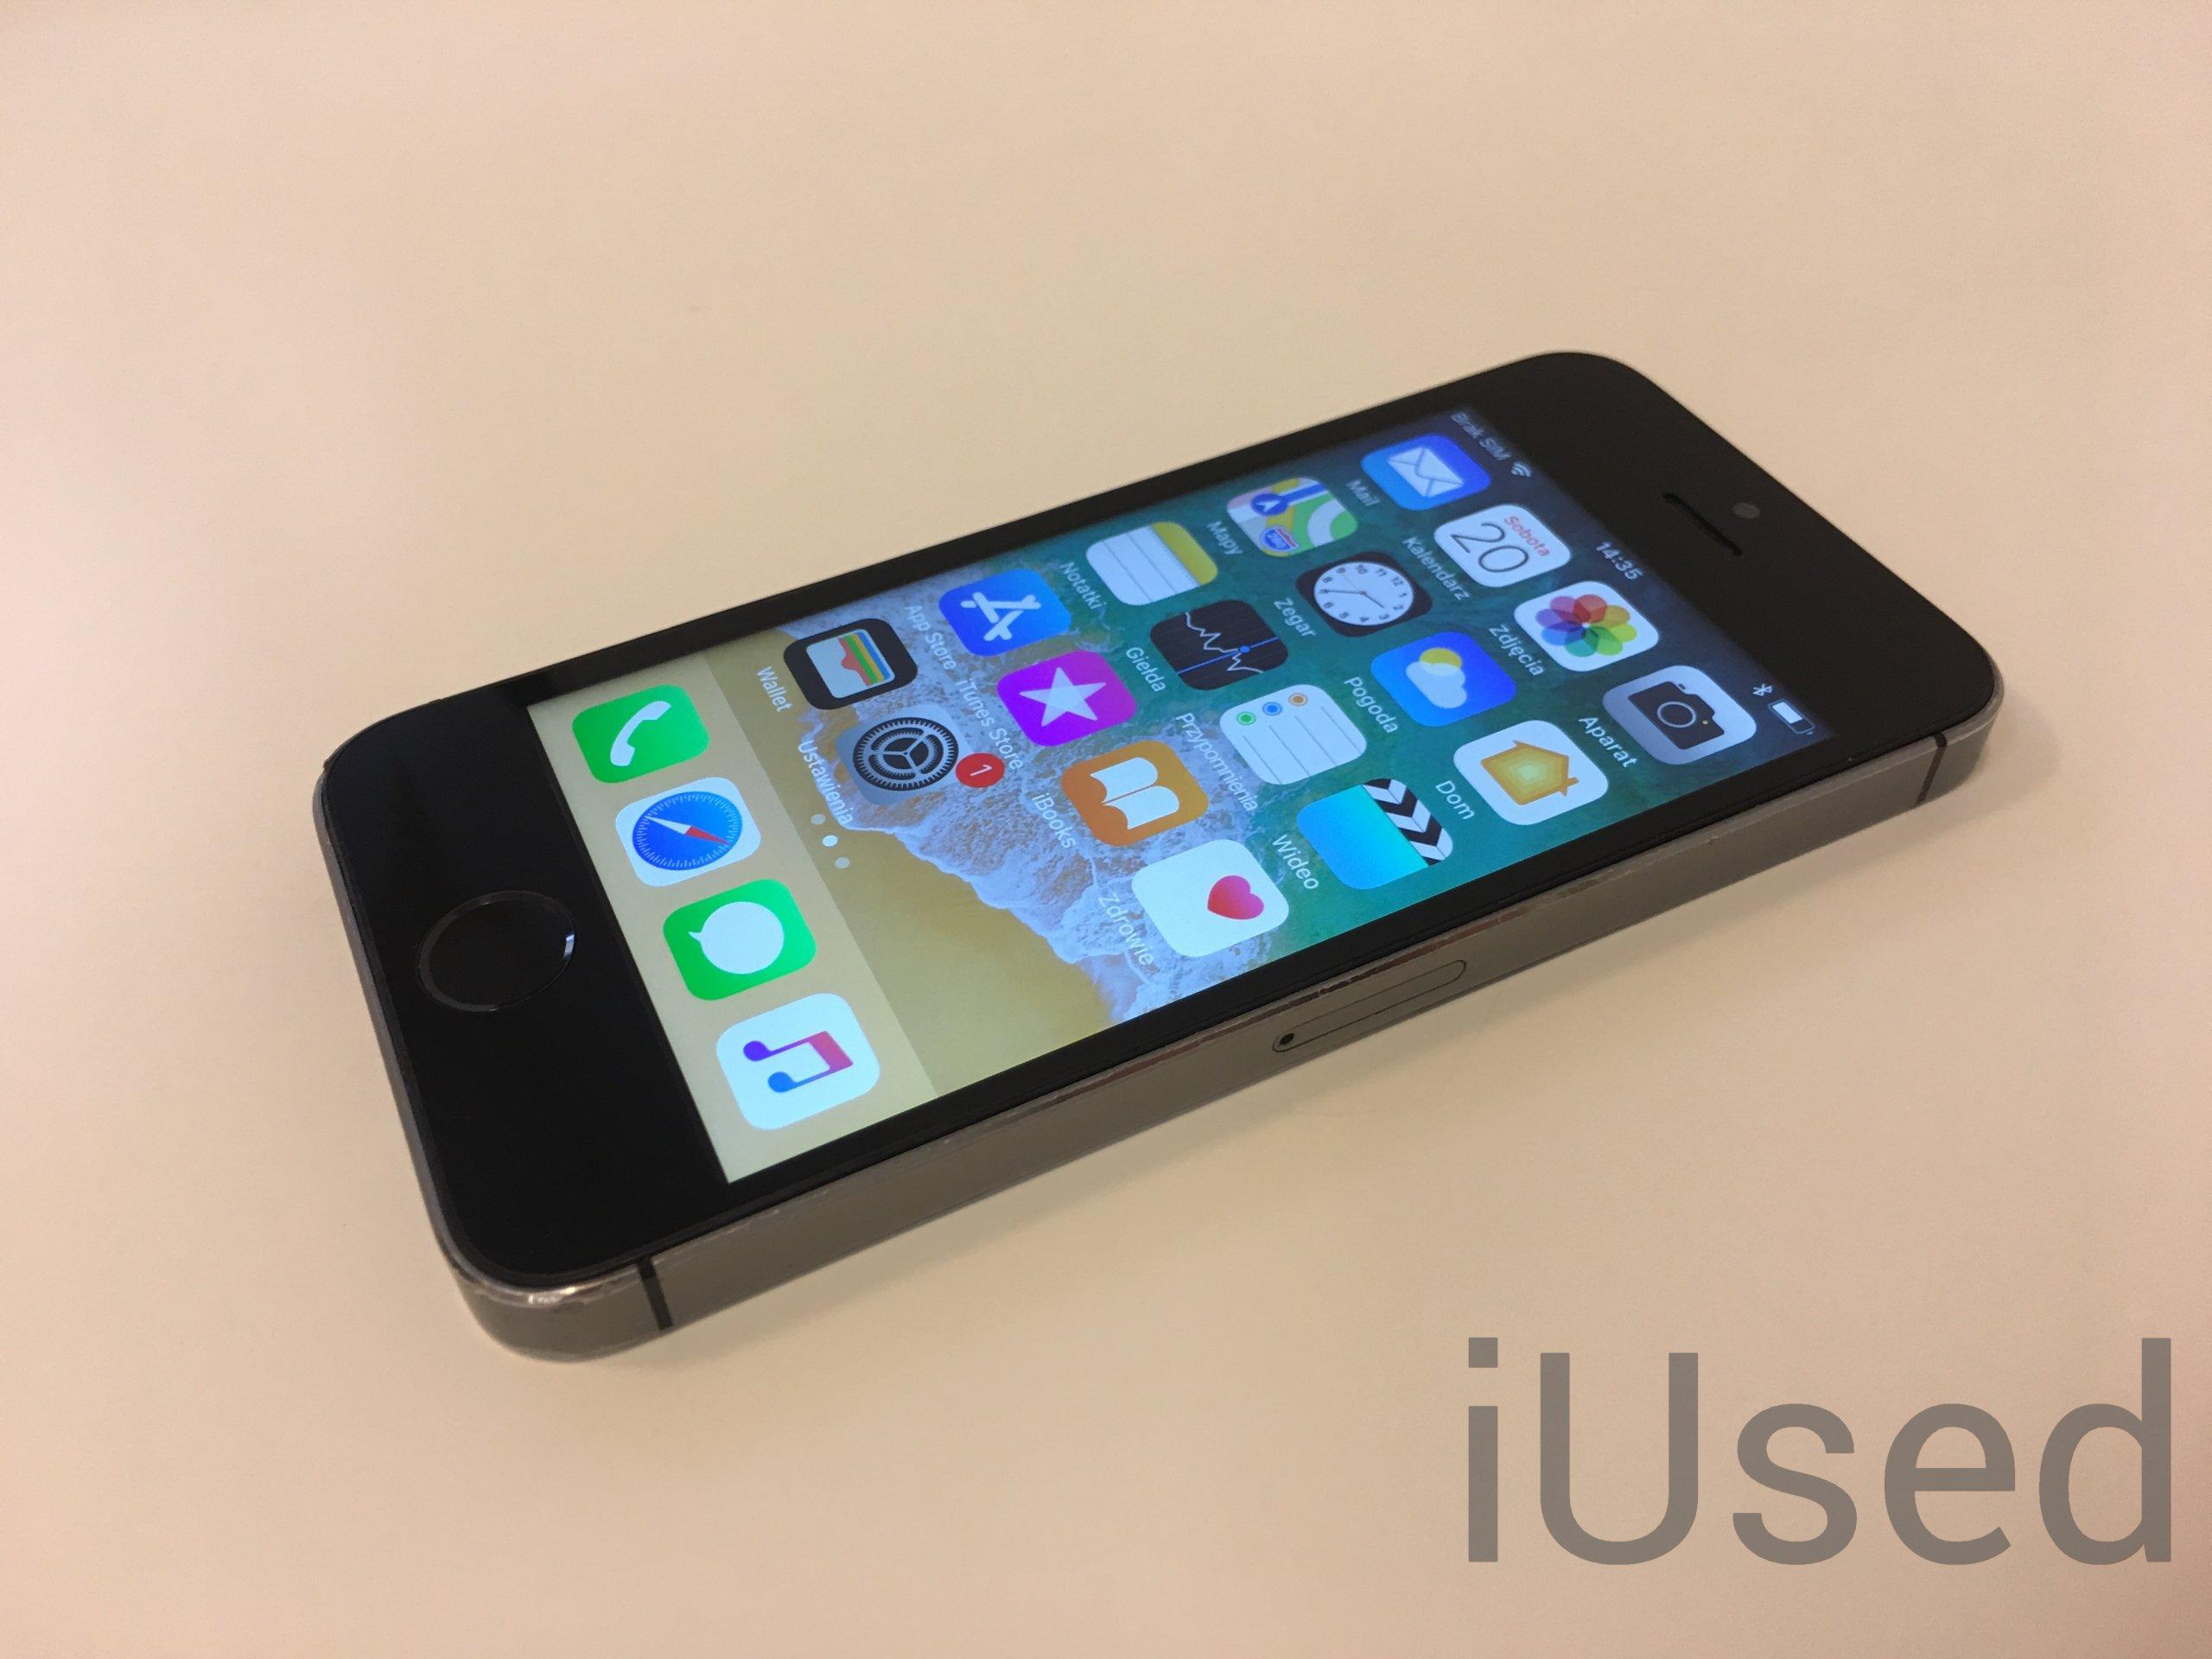 Apple iPhone 5S Space Grey 16GB od iUsed GW12M